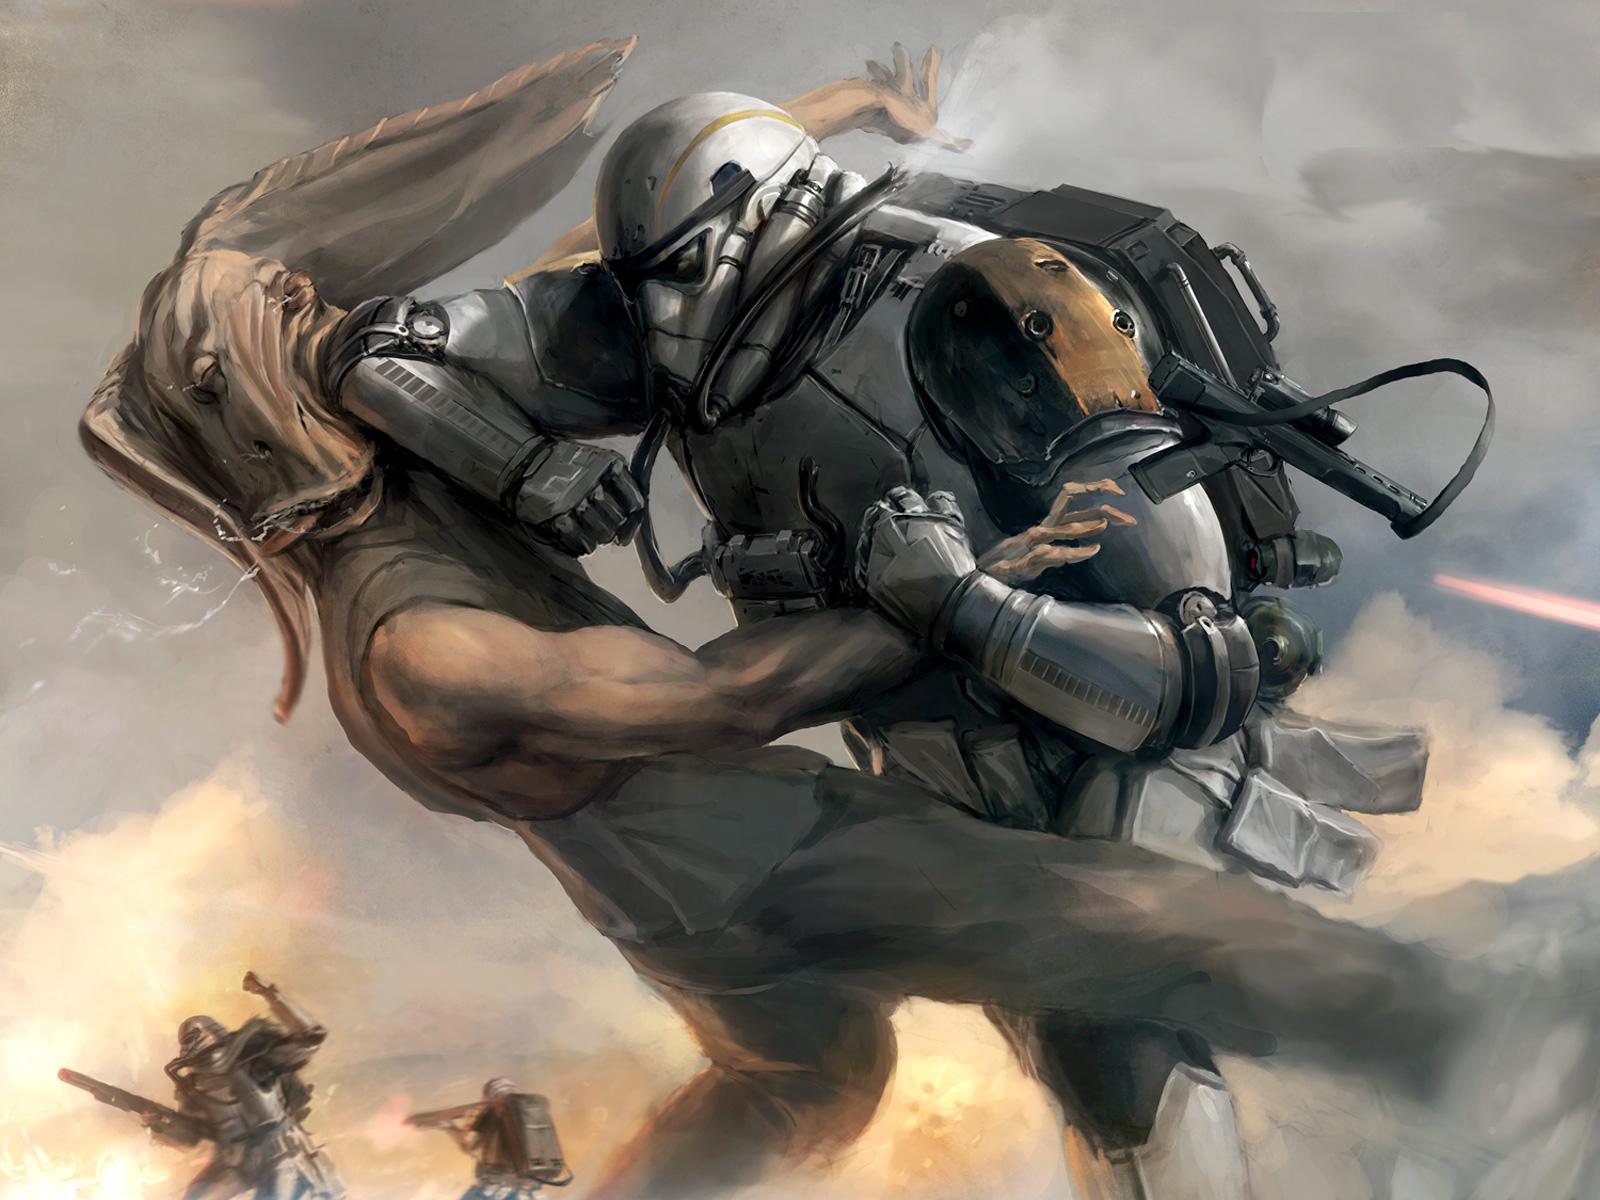 top ten star wars wallpaper [lists] - the geek twins